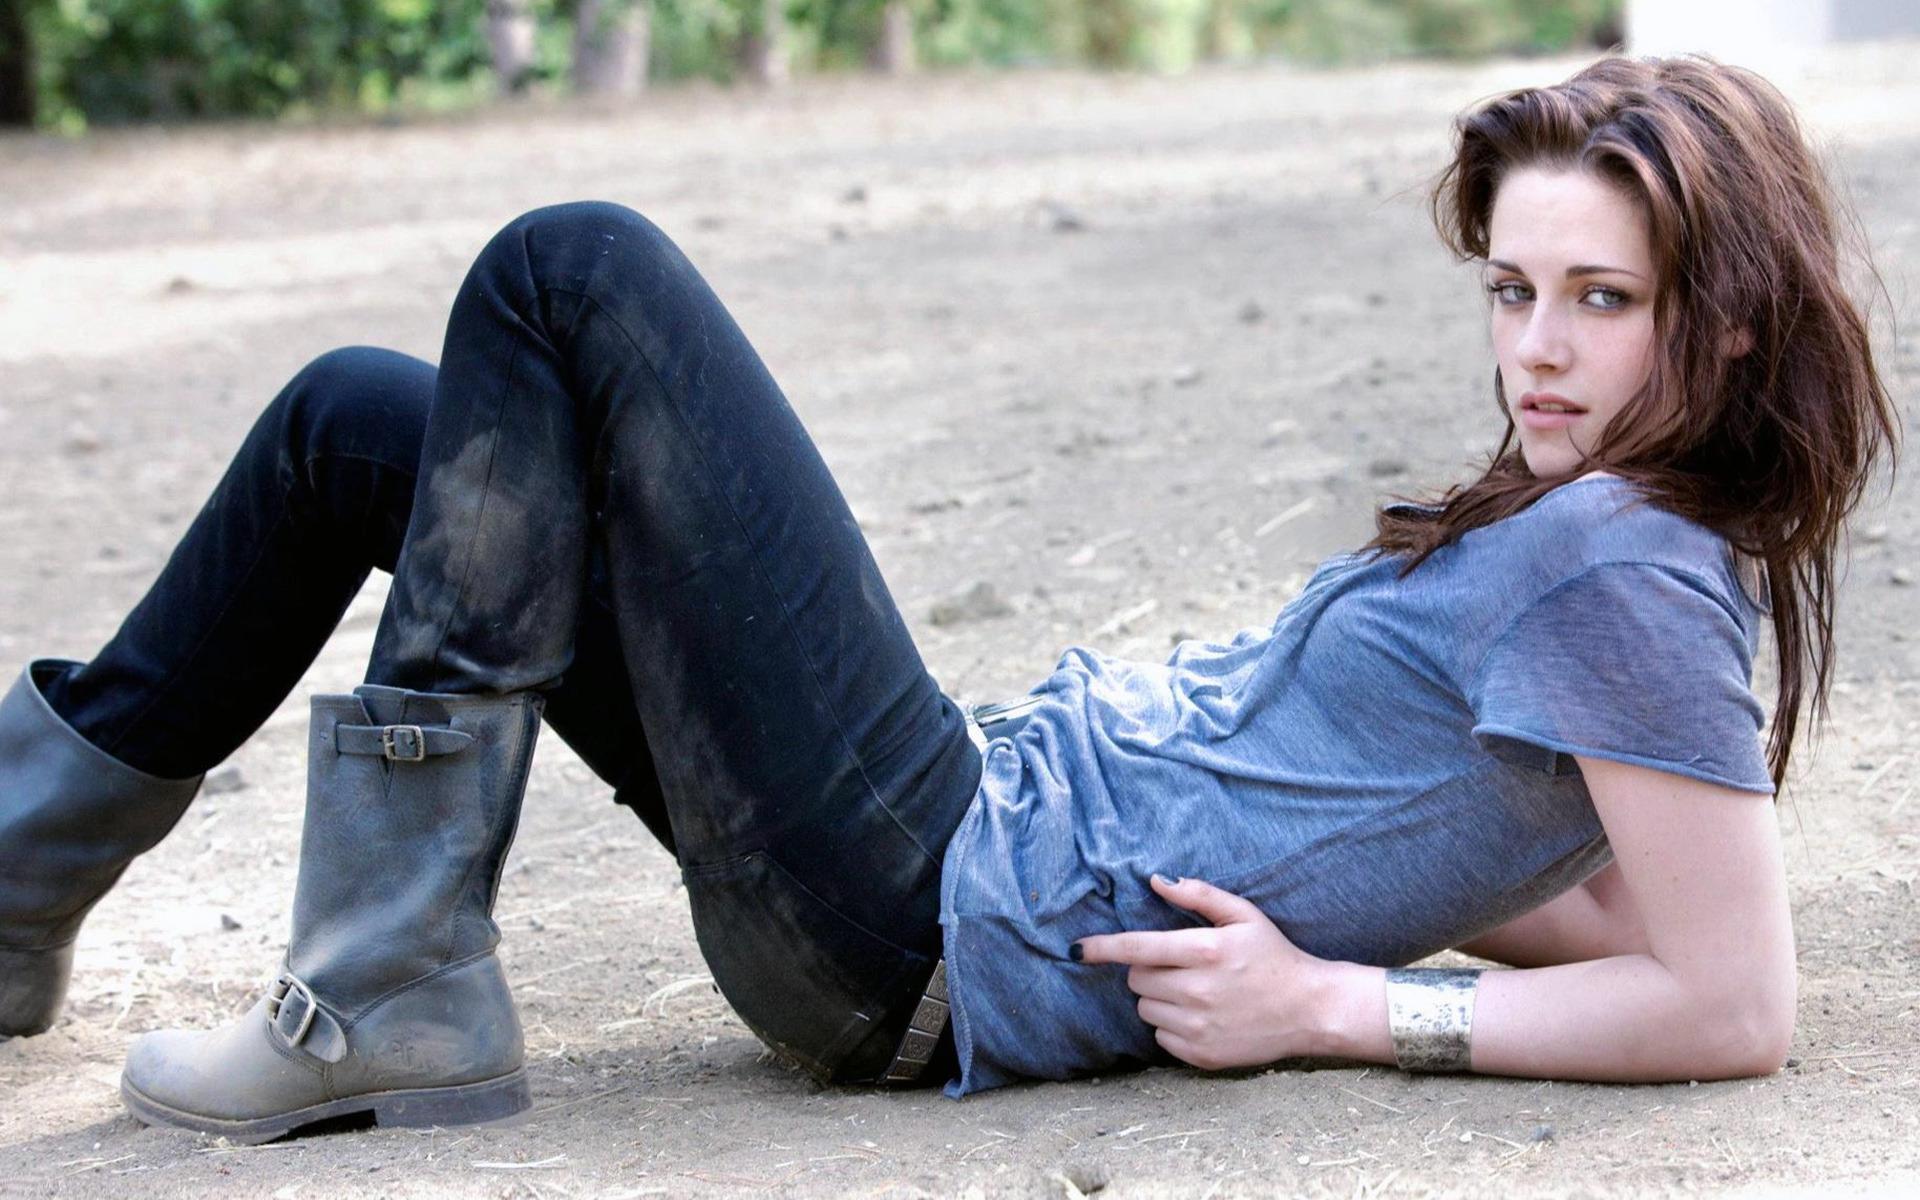 Most Beautiful Kristen Stewart HD Wallpapers - All HD Wallpapers